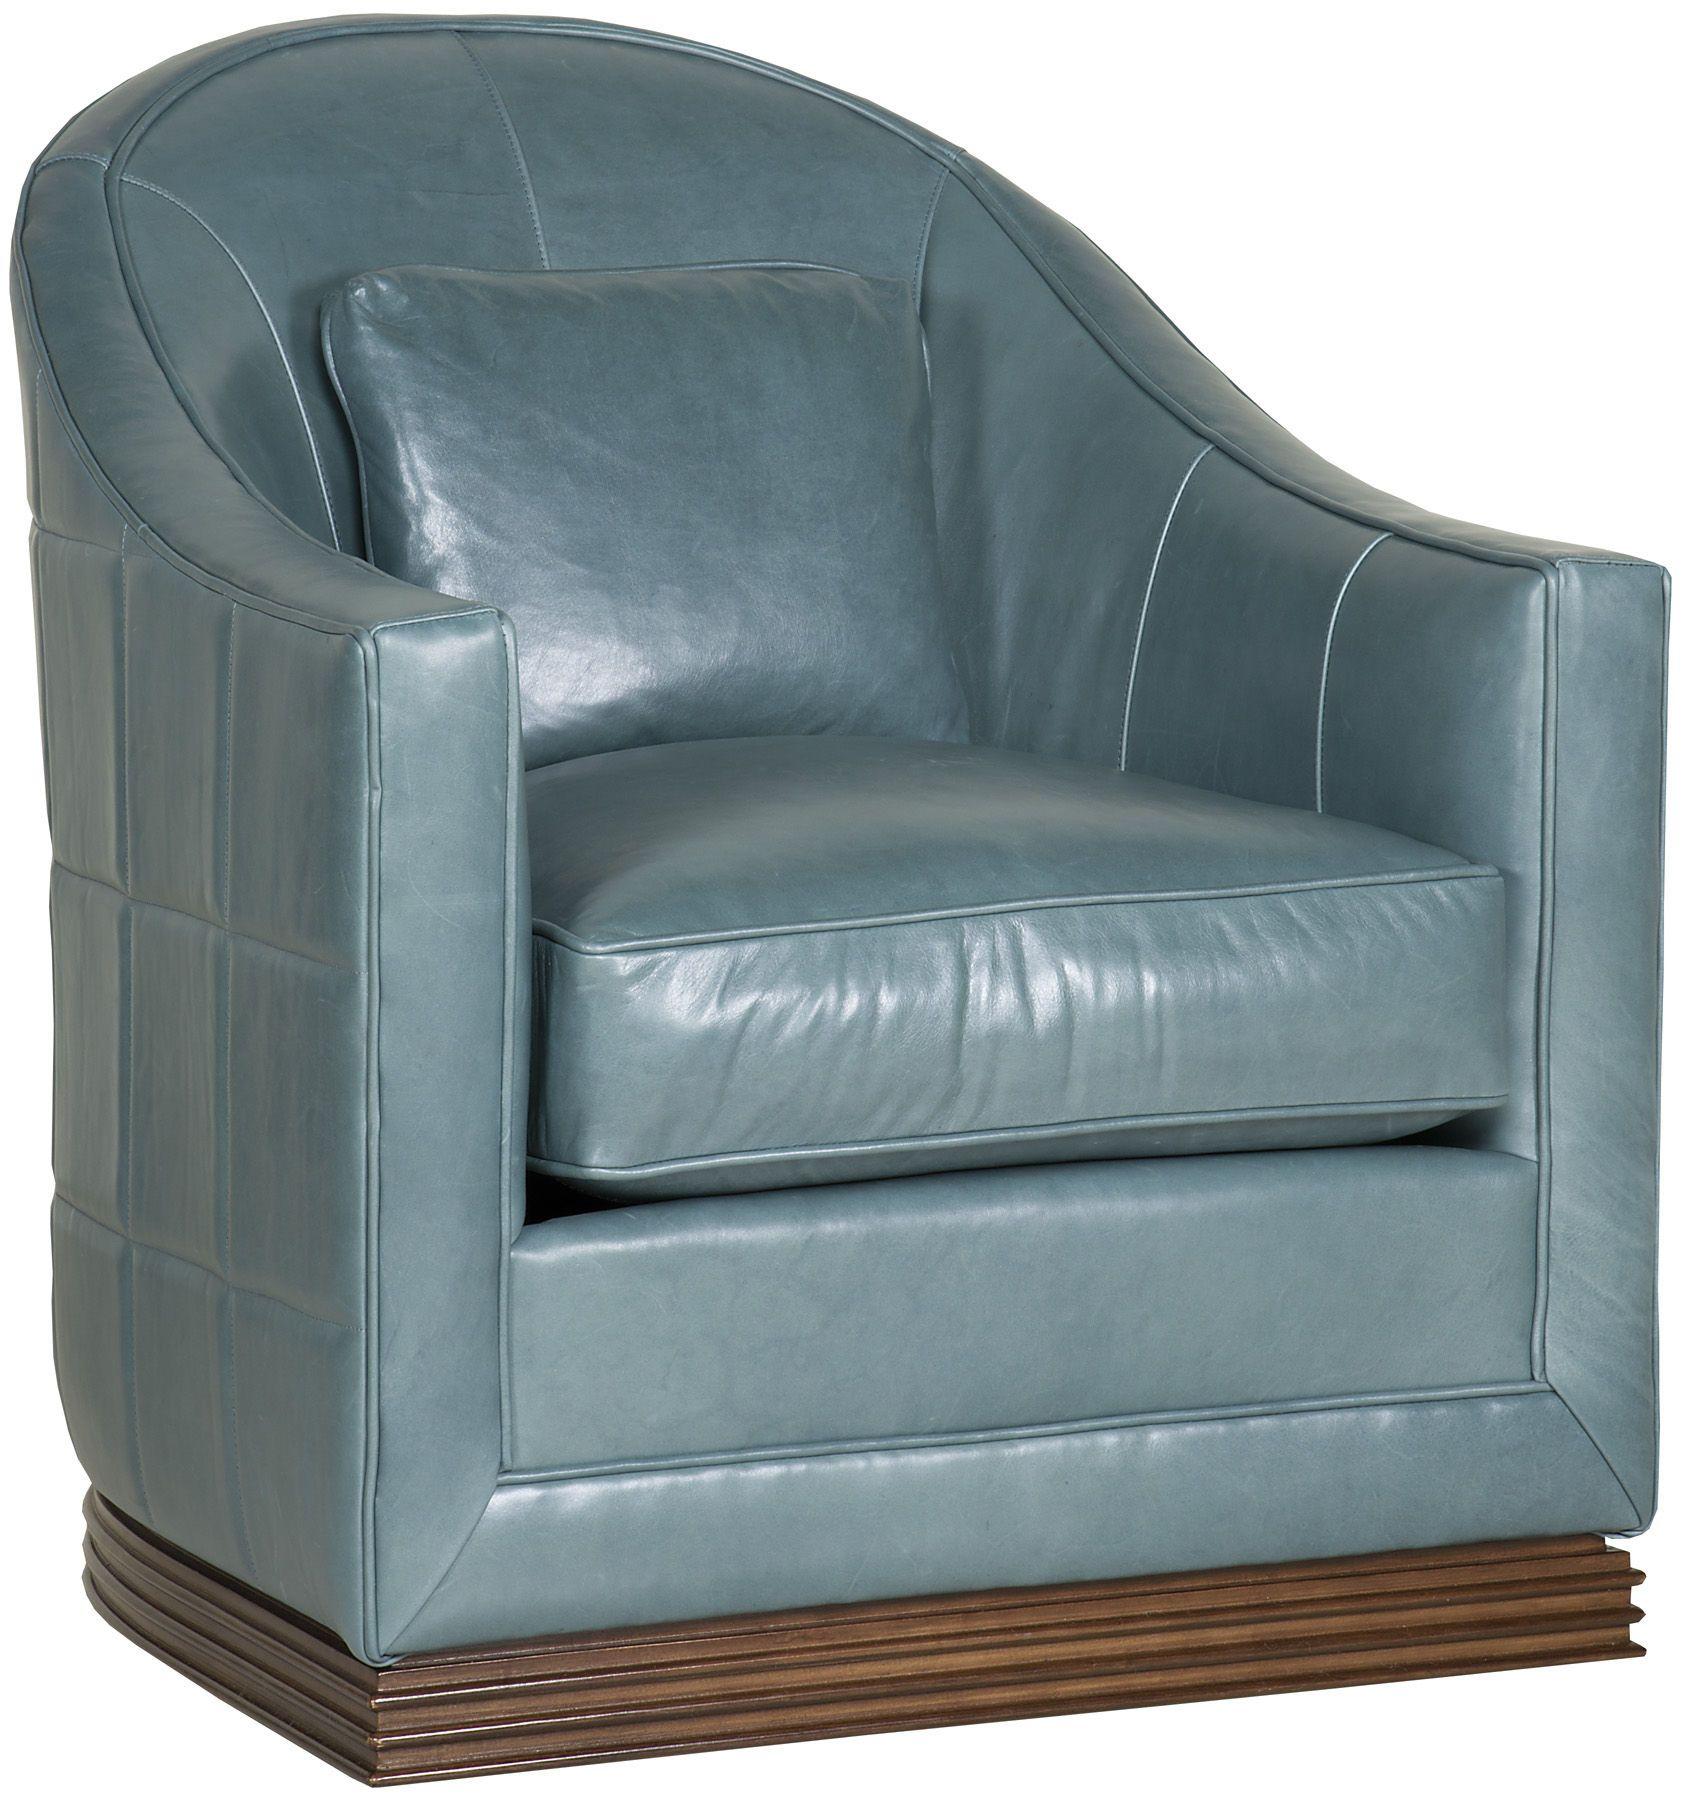 Vanguard Living Room Swivel Chair V599 SW   Vanguard Furniture   Conover, NC